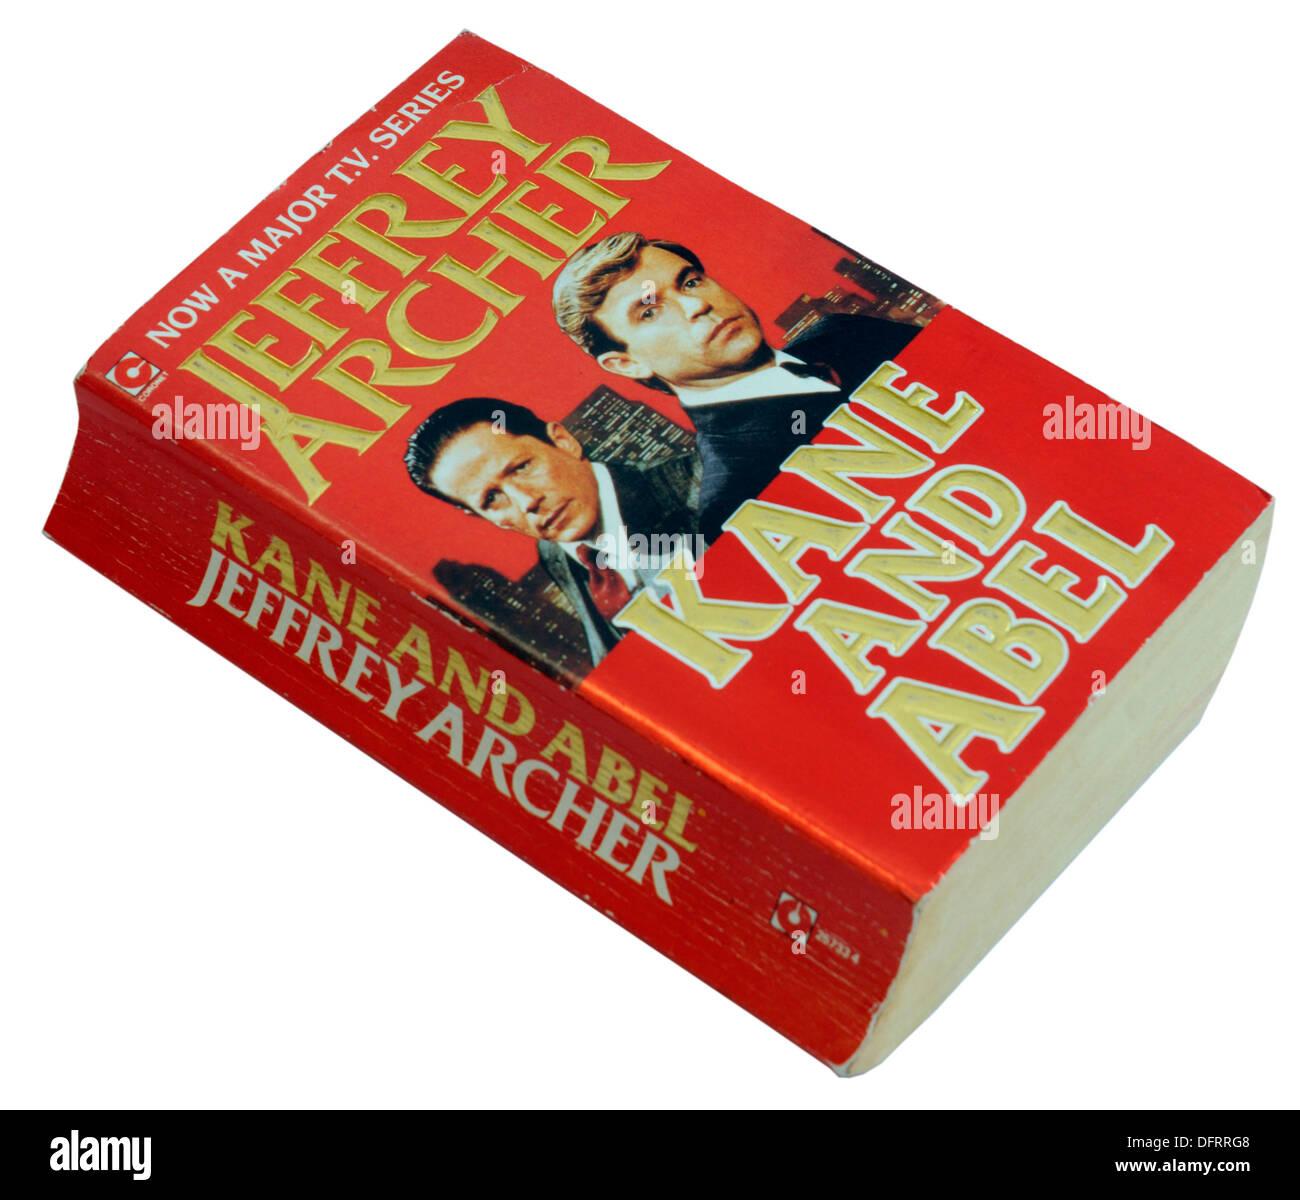 Kane and Abel by Jeffrey Archer - Stock Image